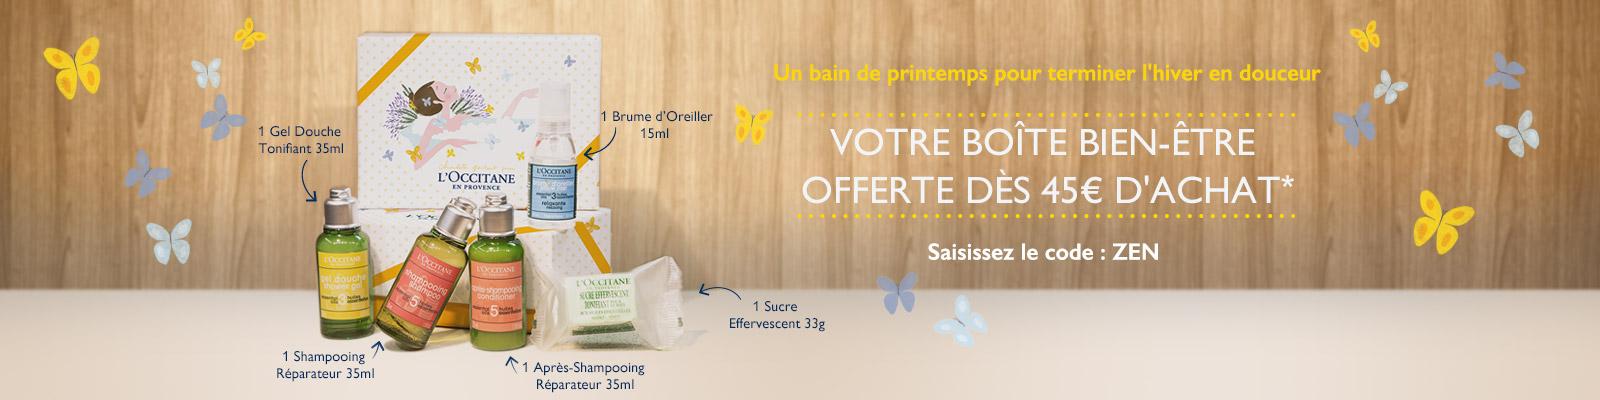 Offre Divine - L'Occitane France